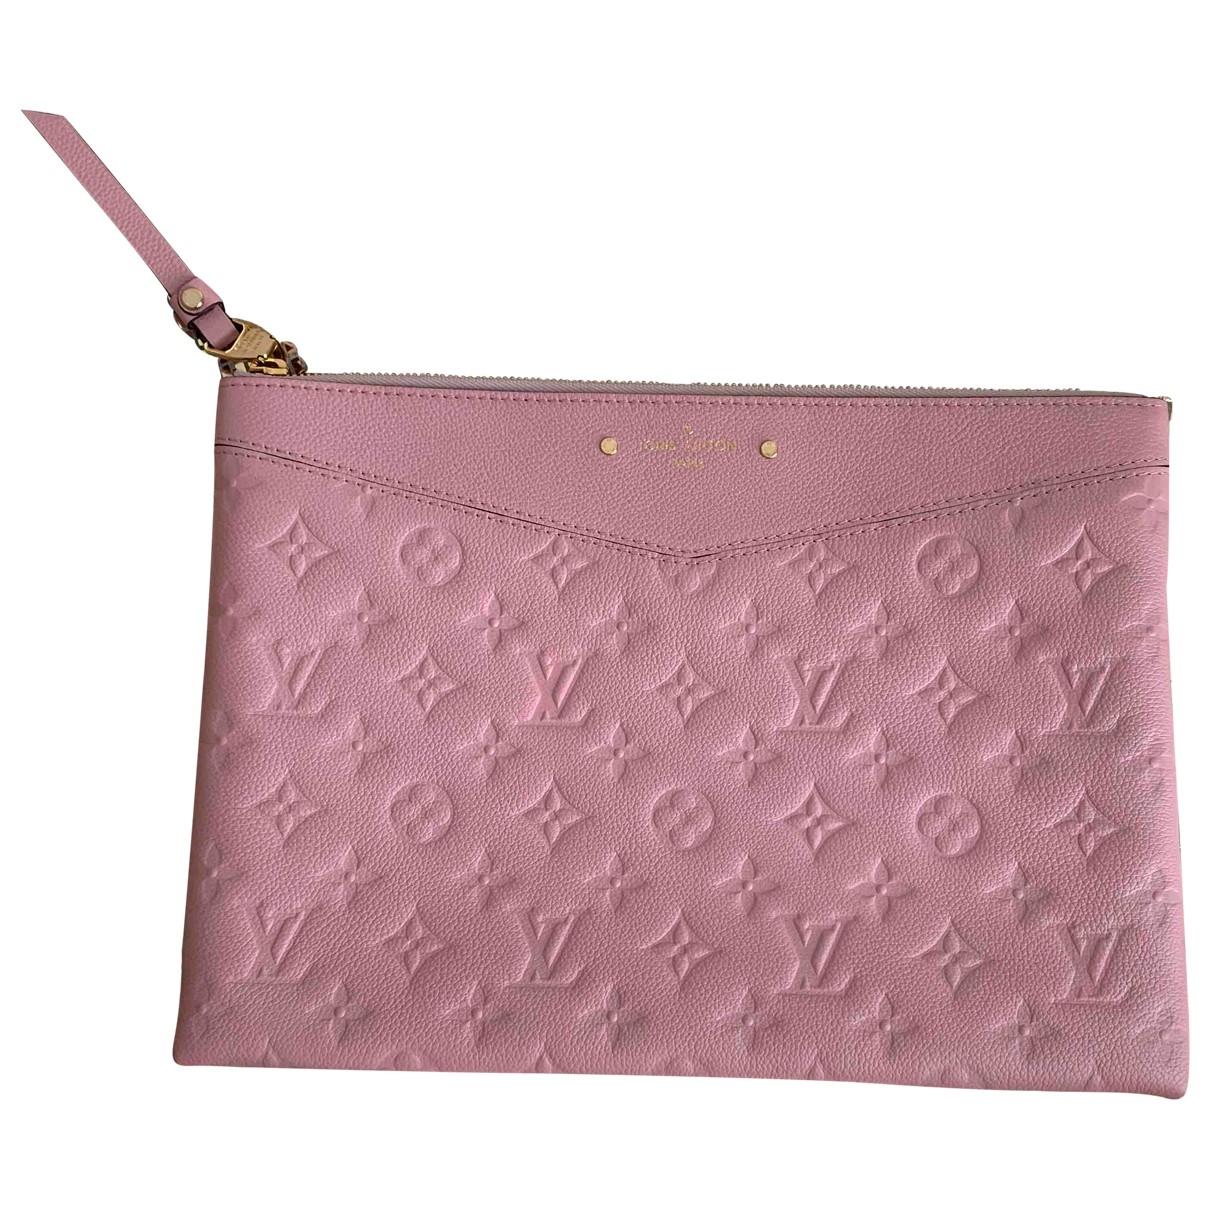 Louis Vuitton \N Clutch in  Rosa Leder